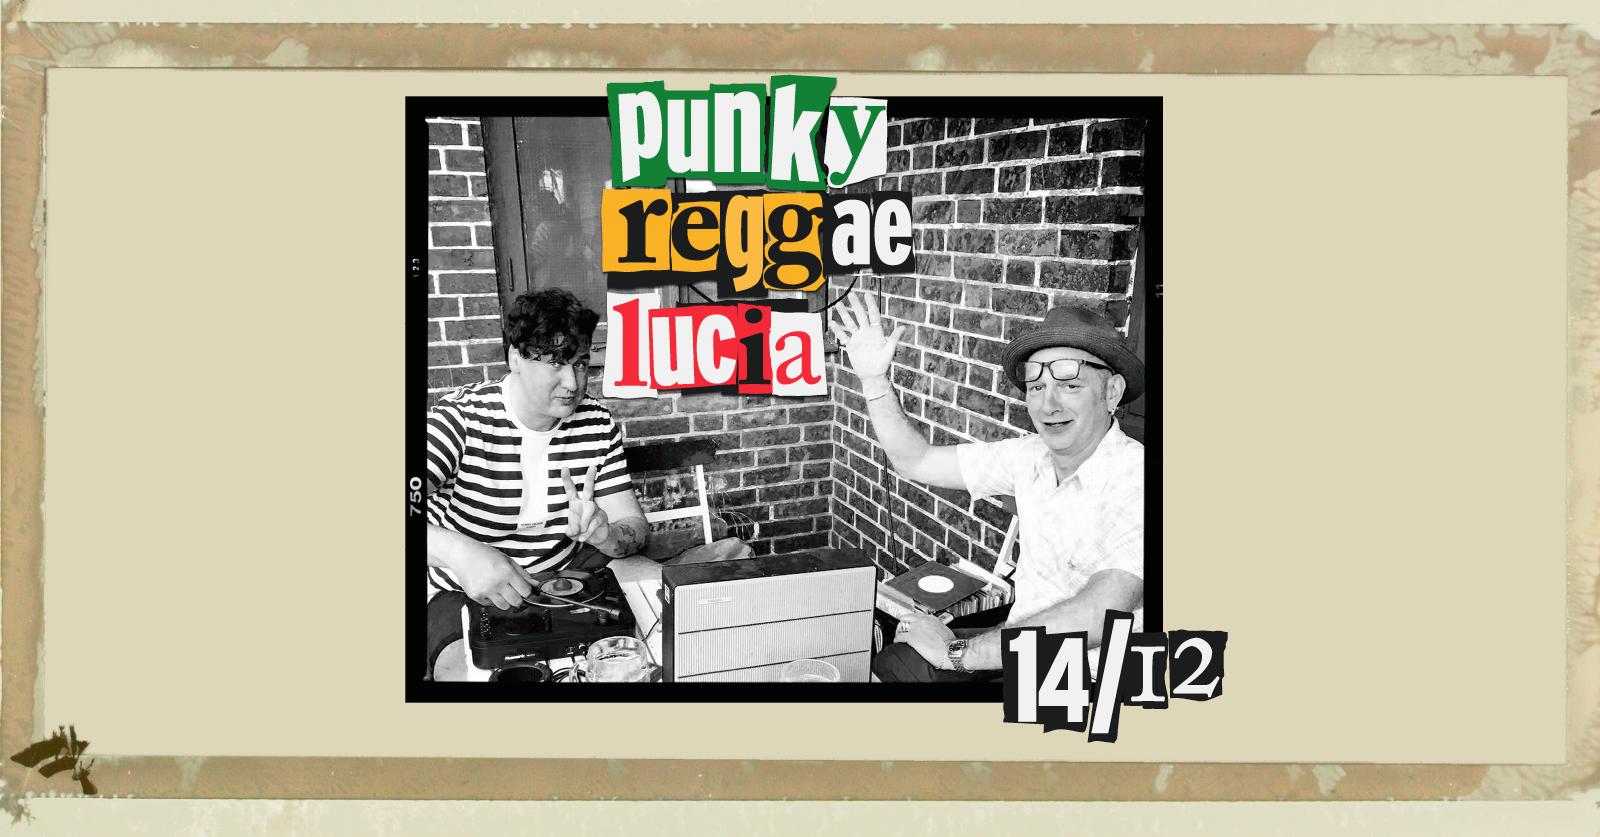 Punky Reggae Party Musikhjälpen.png